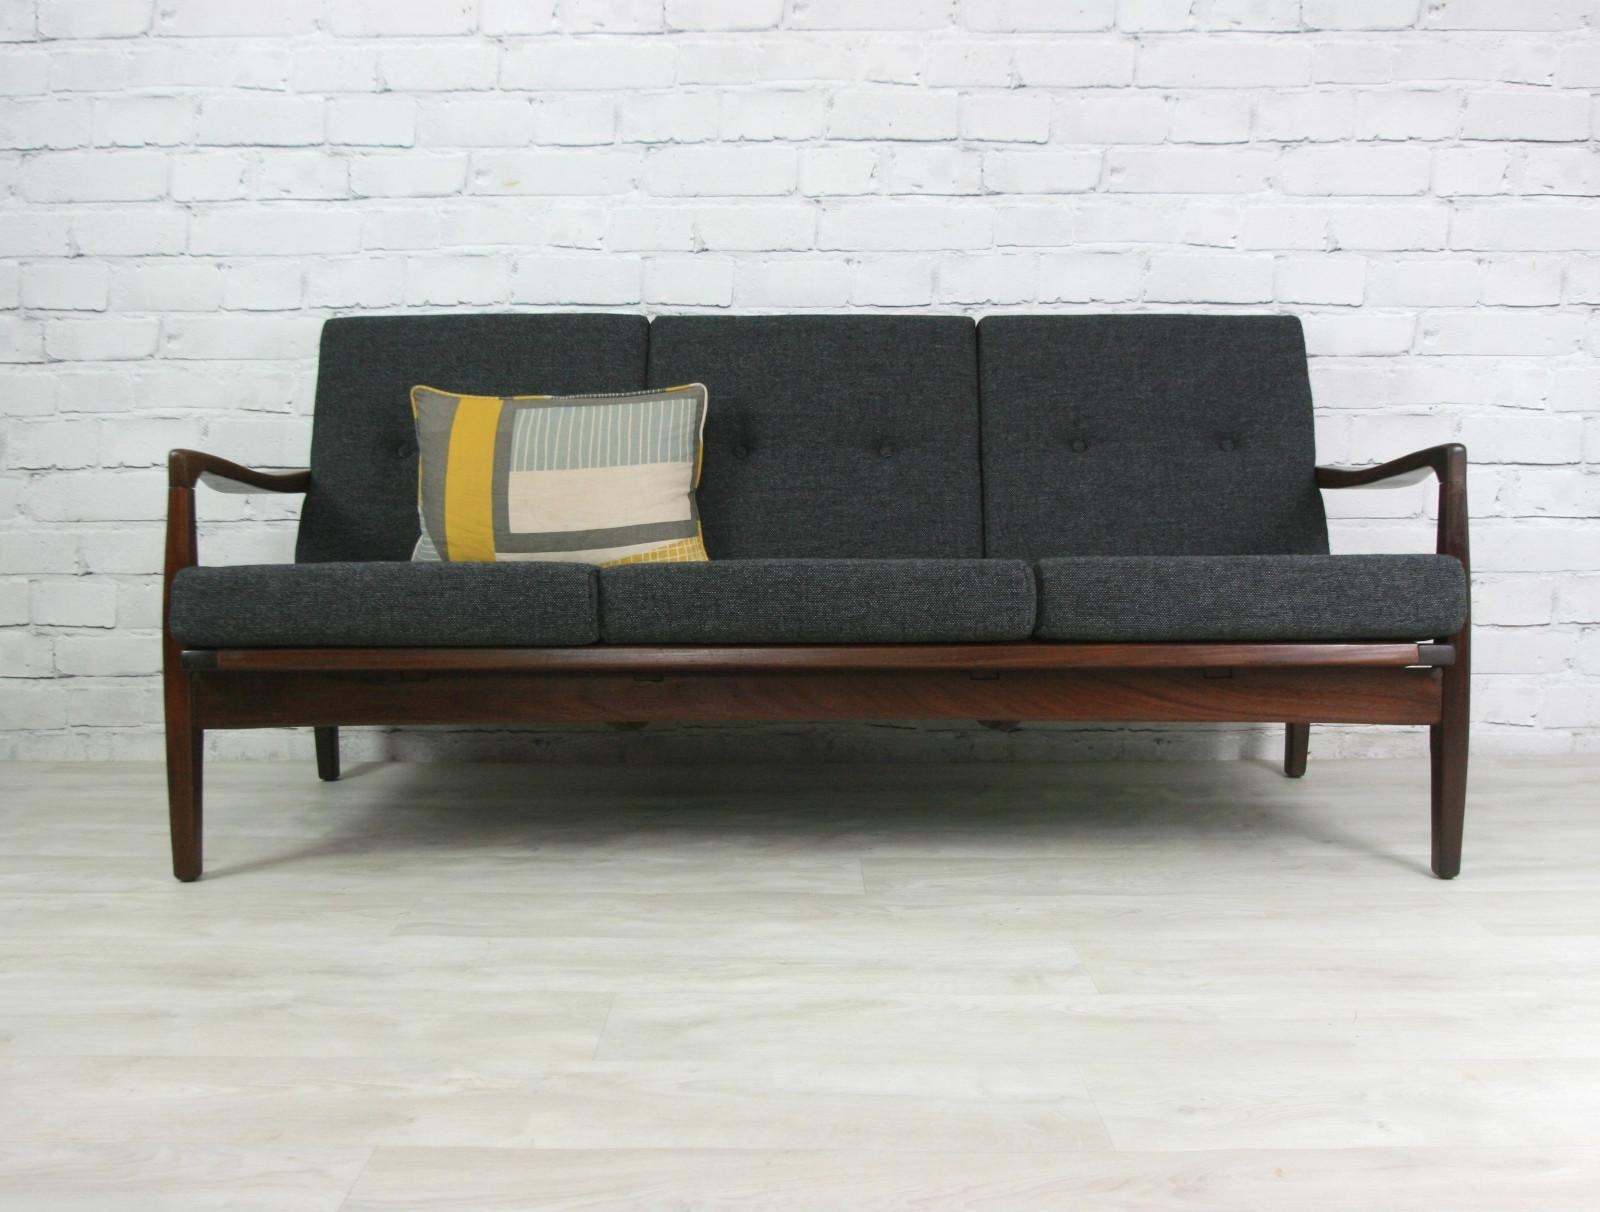 Sofas Center : 45 Remarkable Retro Sofas For Sale Picture Throughout Retro Sofas For Sale (View 14 of 20)